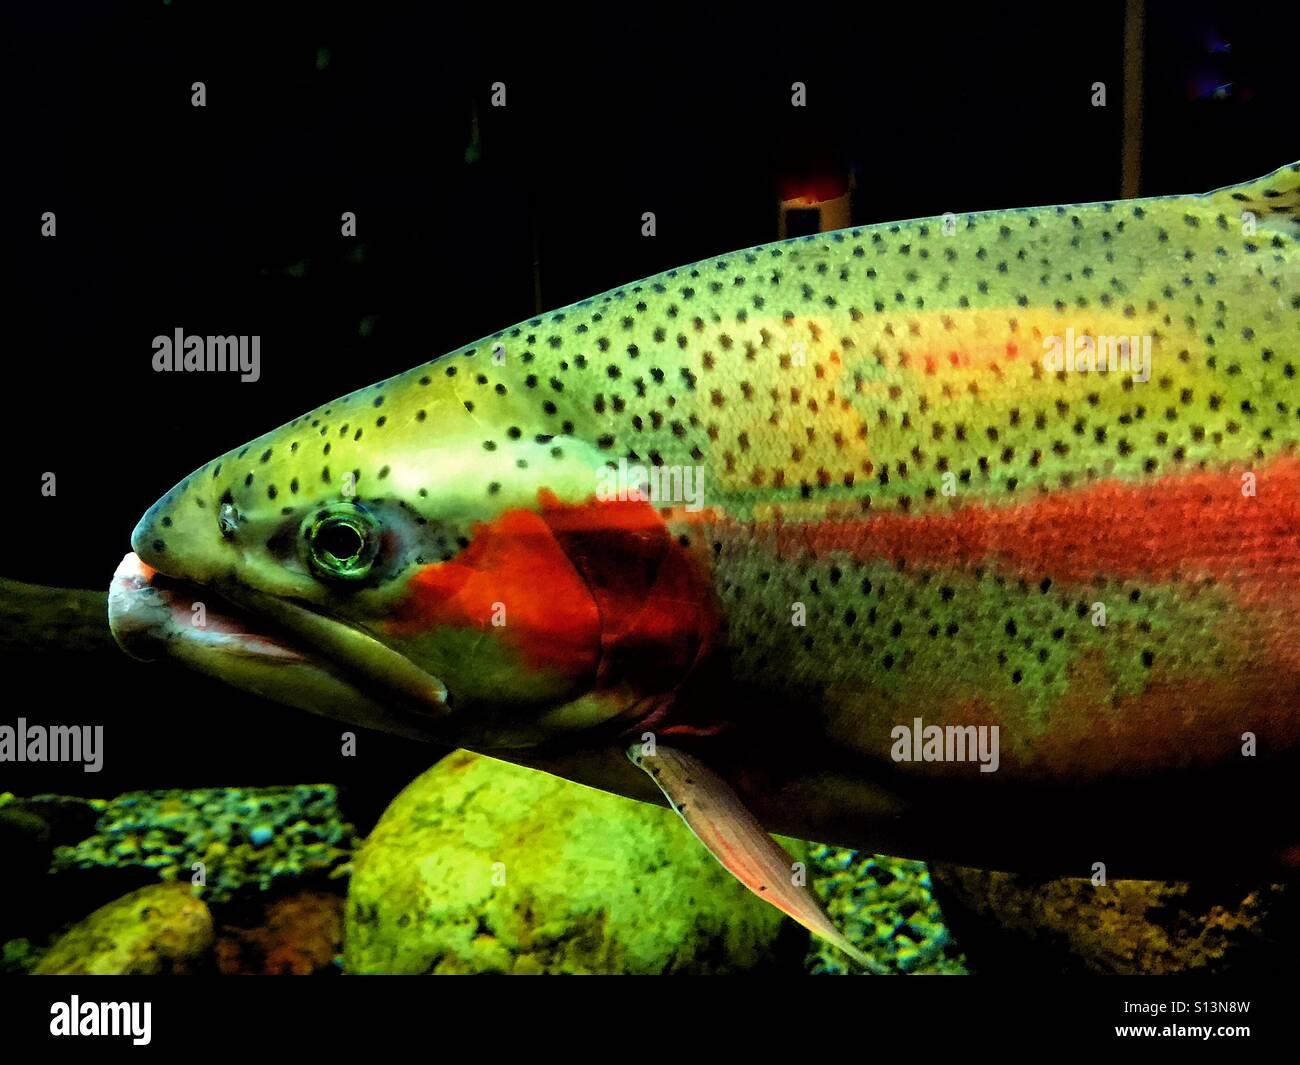 Rain bow trout in an aquarium - Stock Image